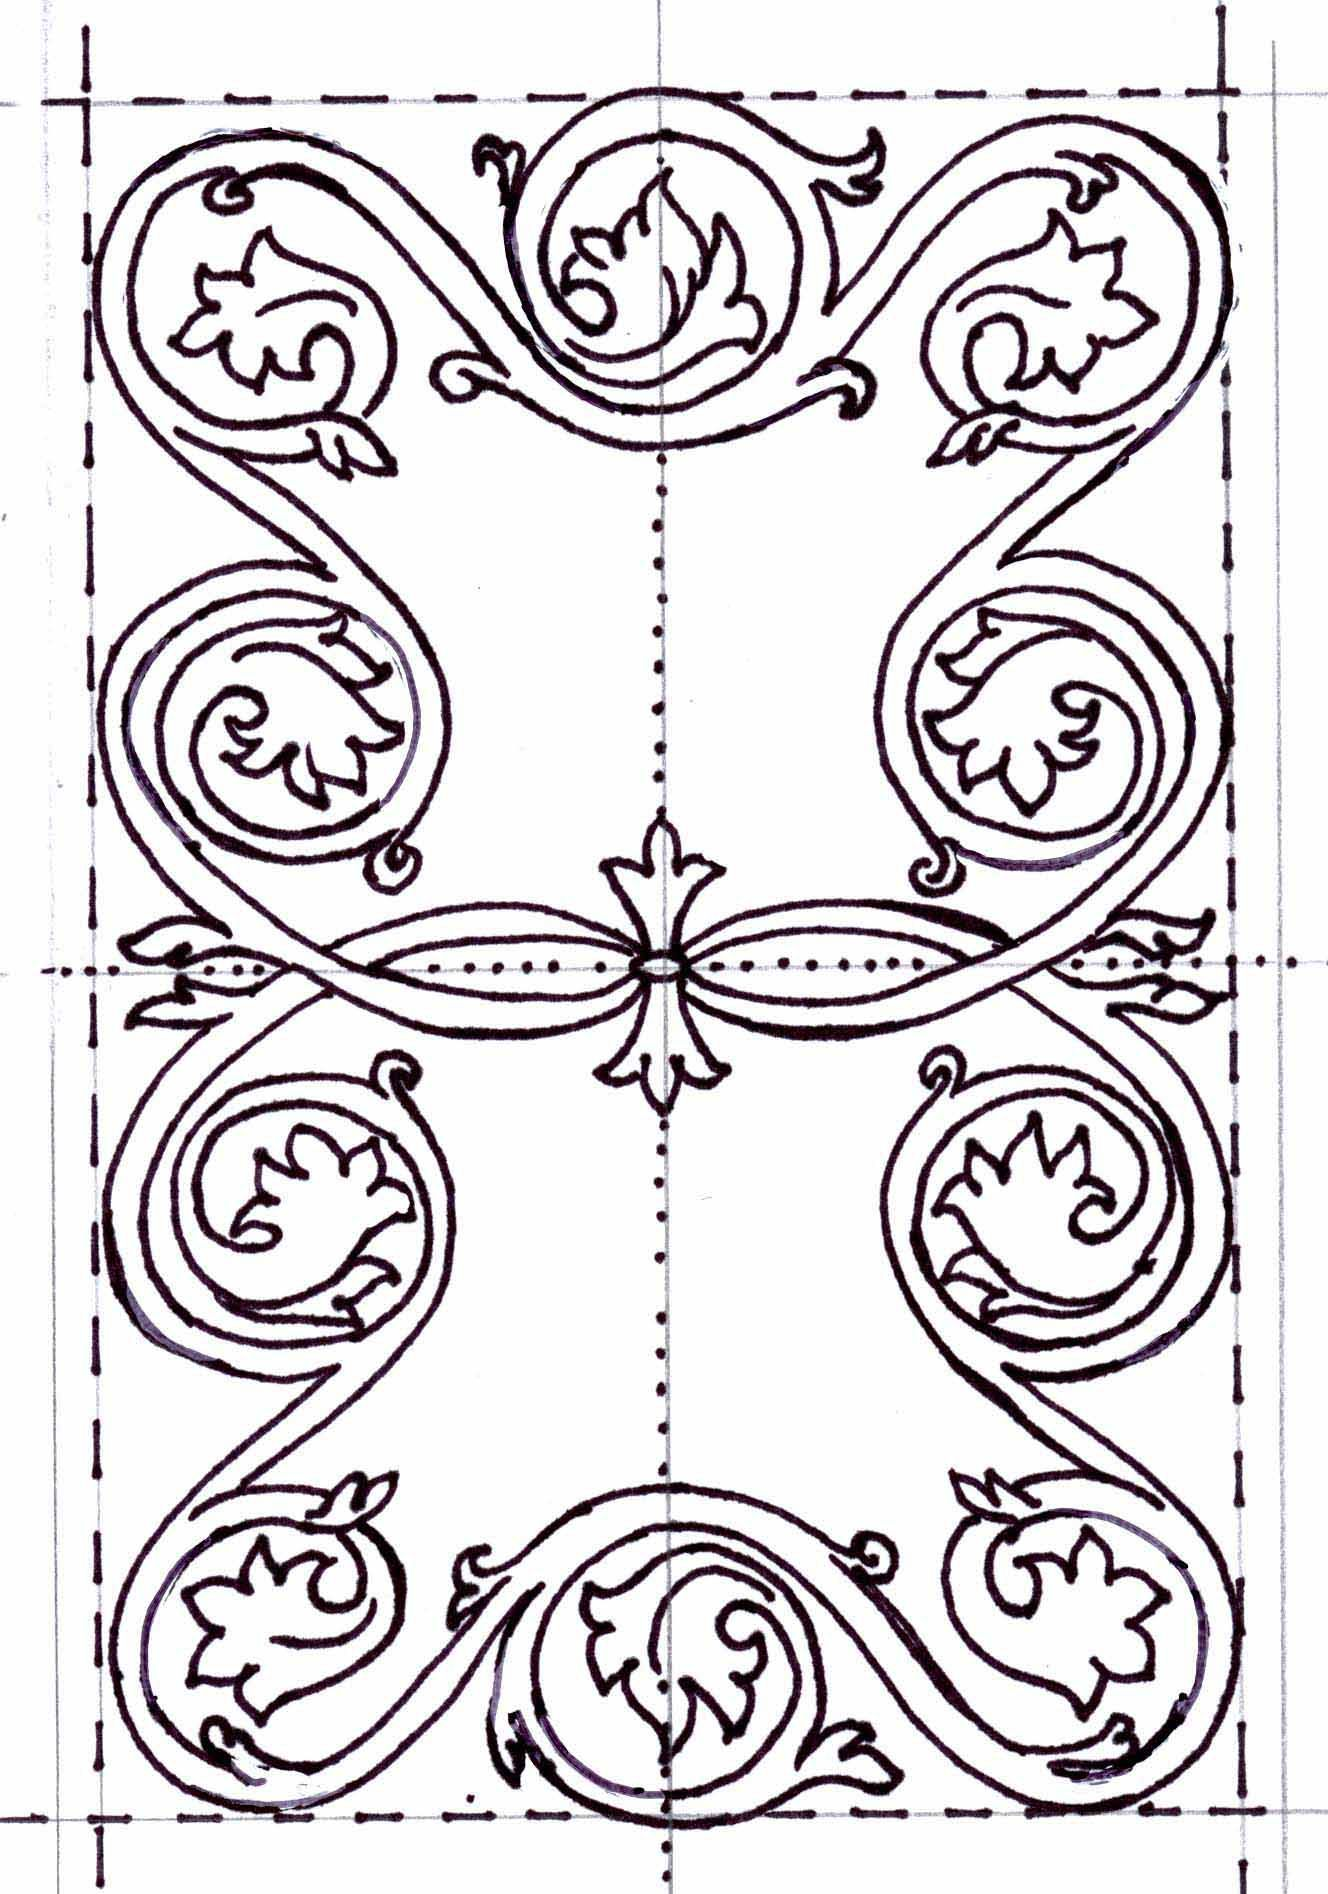 Girdle book embroidery pattern | blackwork | Pinterest | Embroidery ...